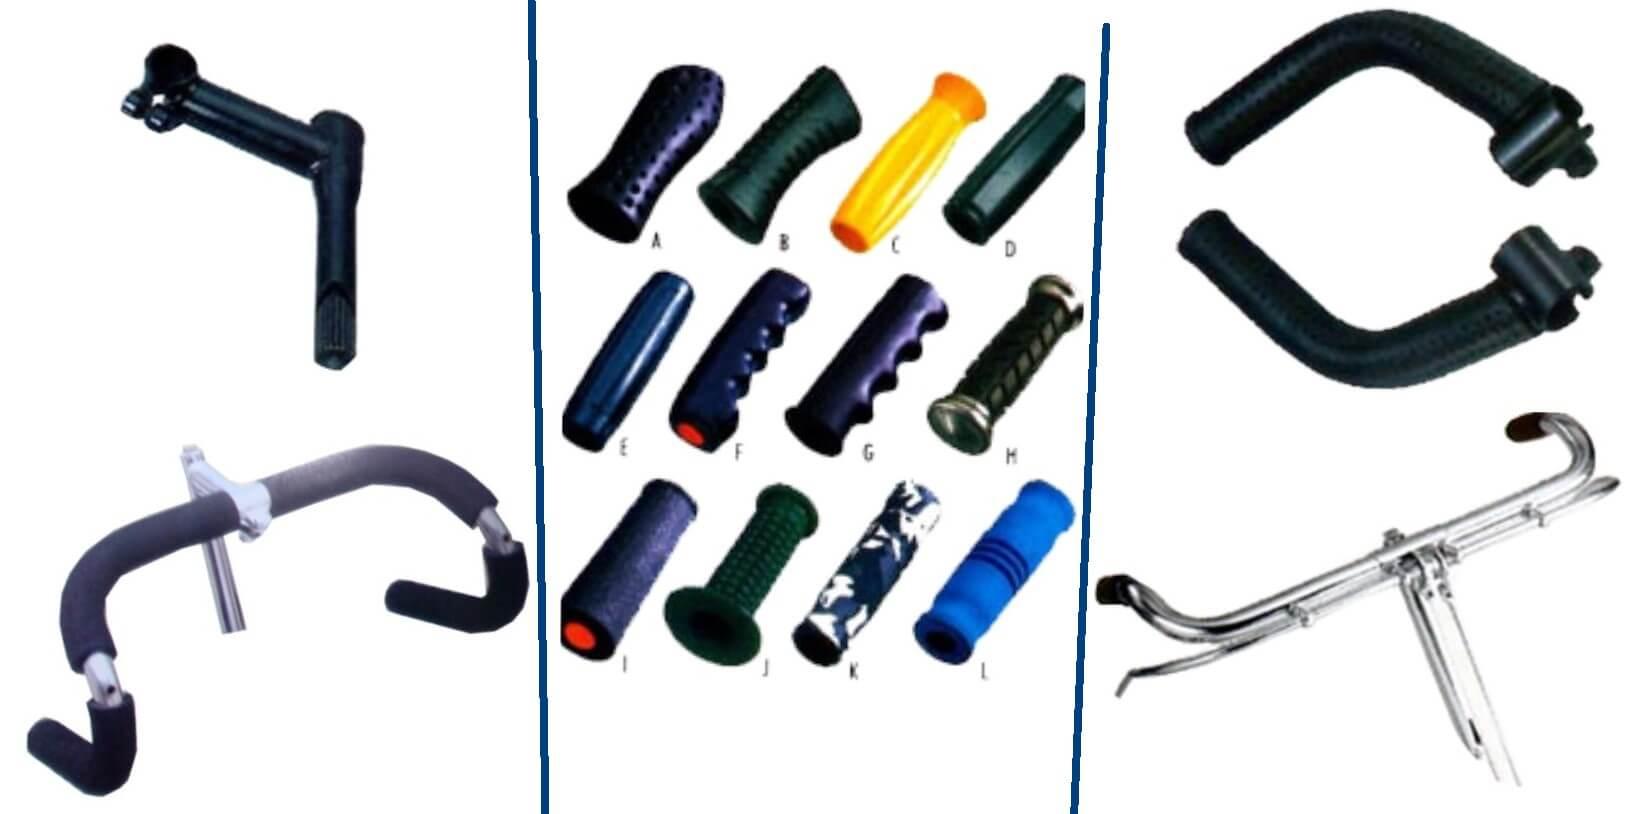 Handle & Accessories